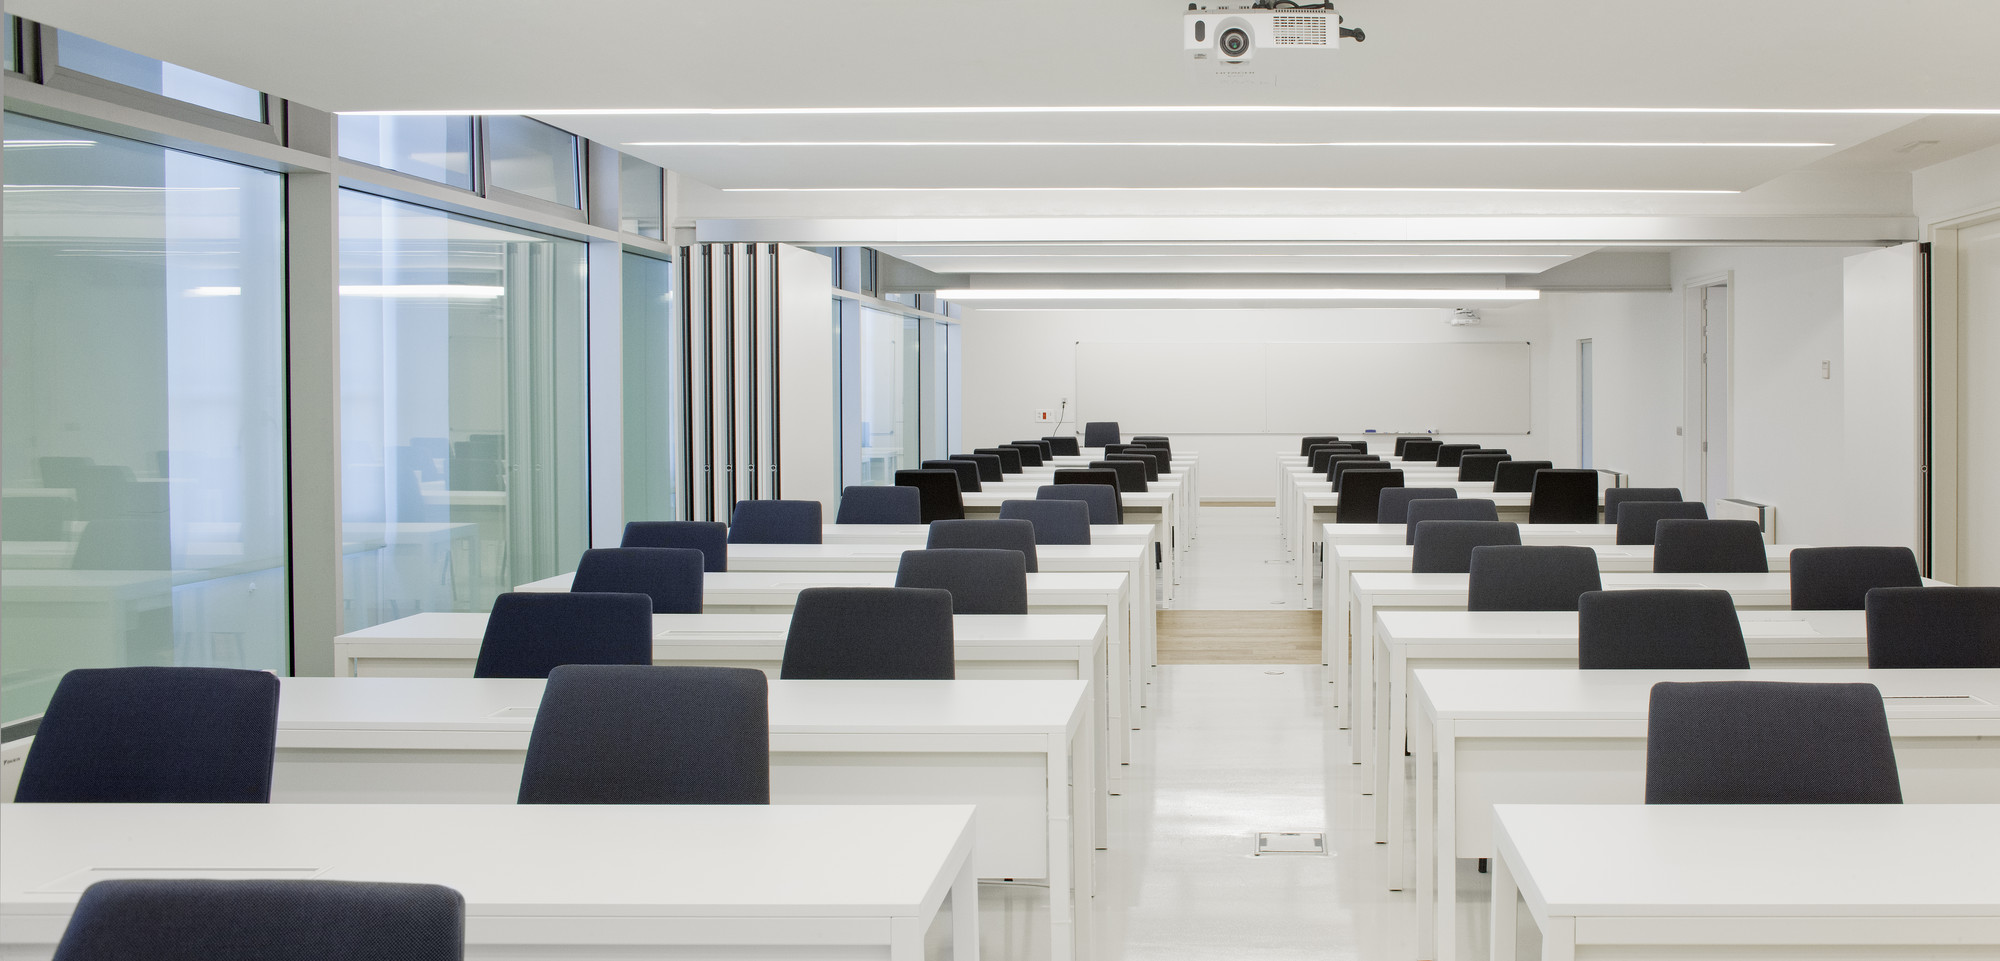 Gallery of Refurbishment of Deusto University / ACXT - 31